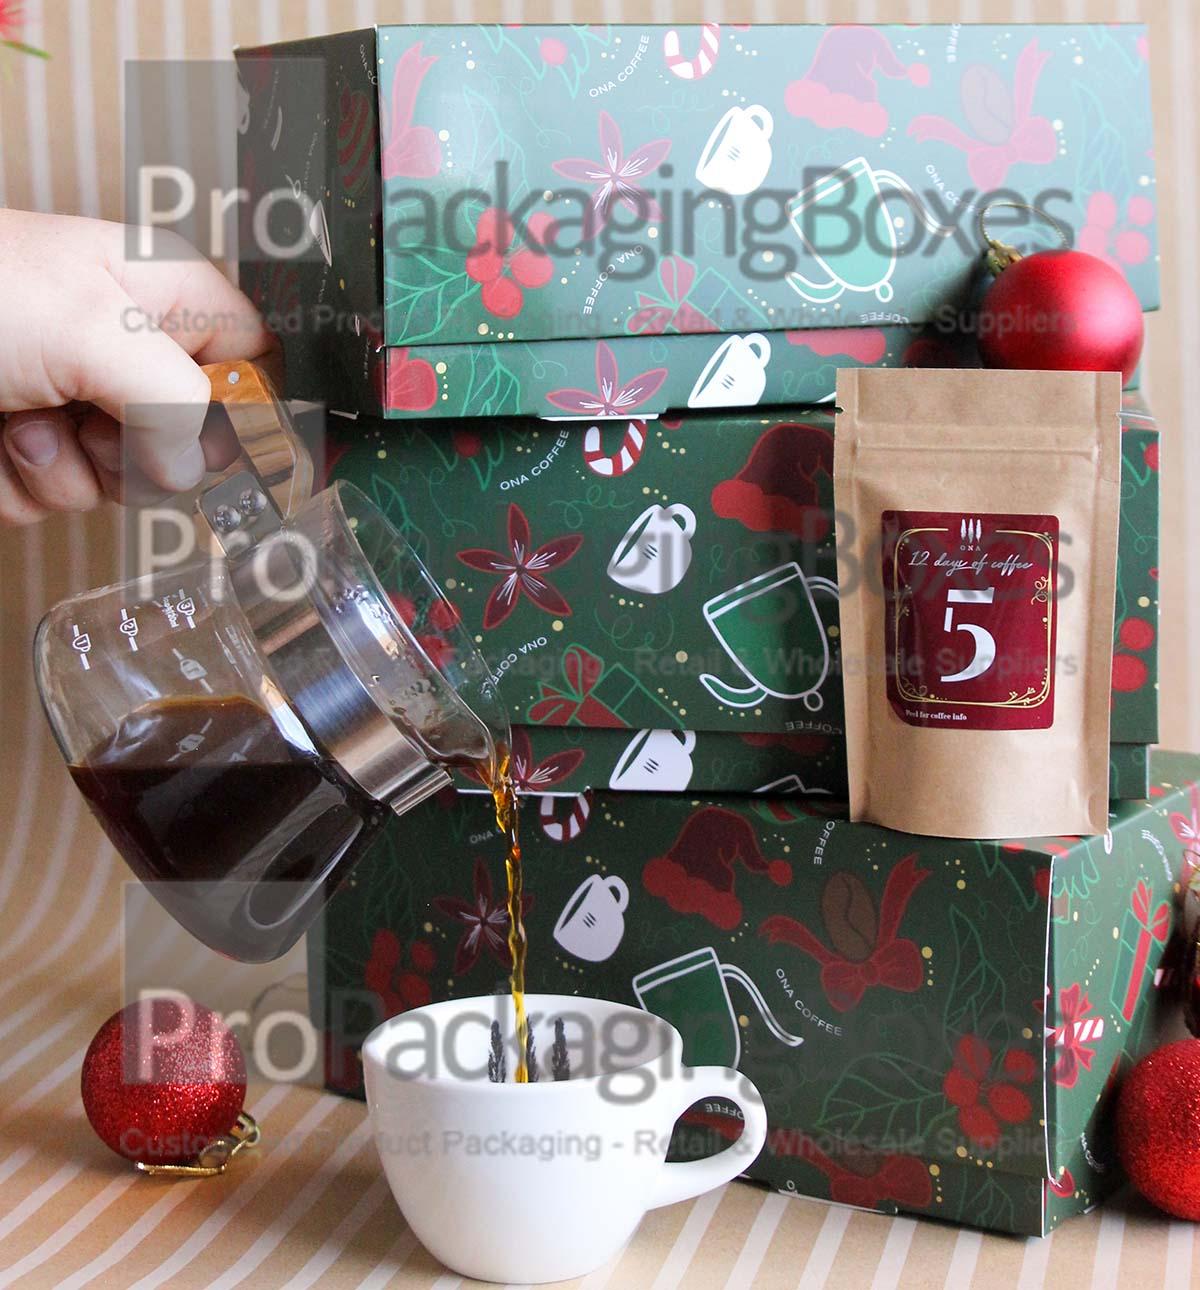 Custom Printed Display Boxes